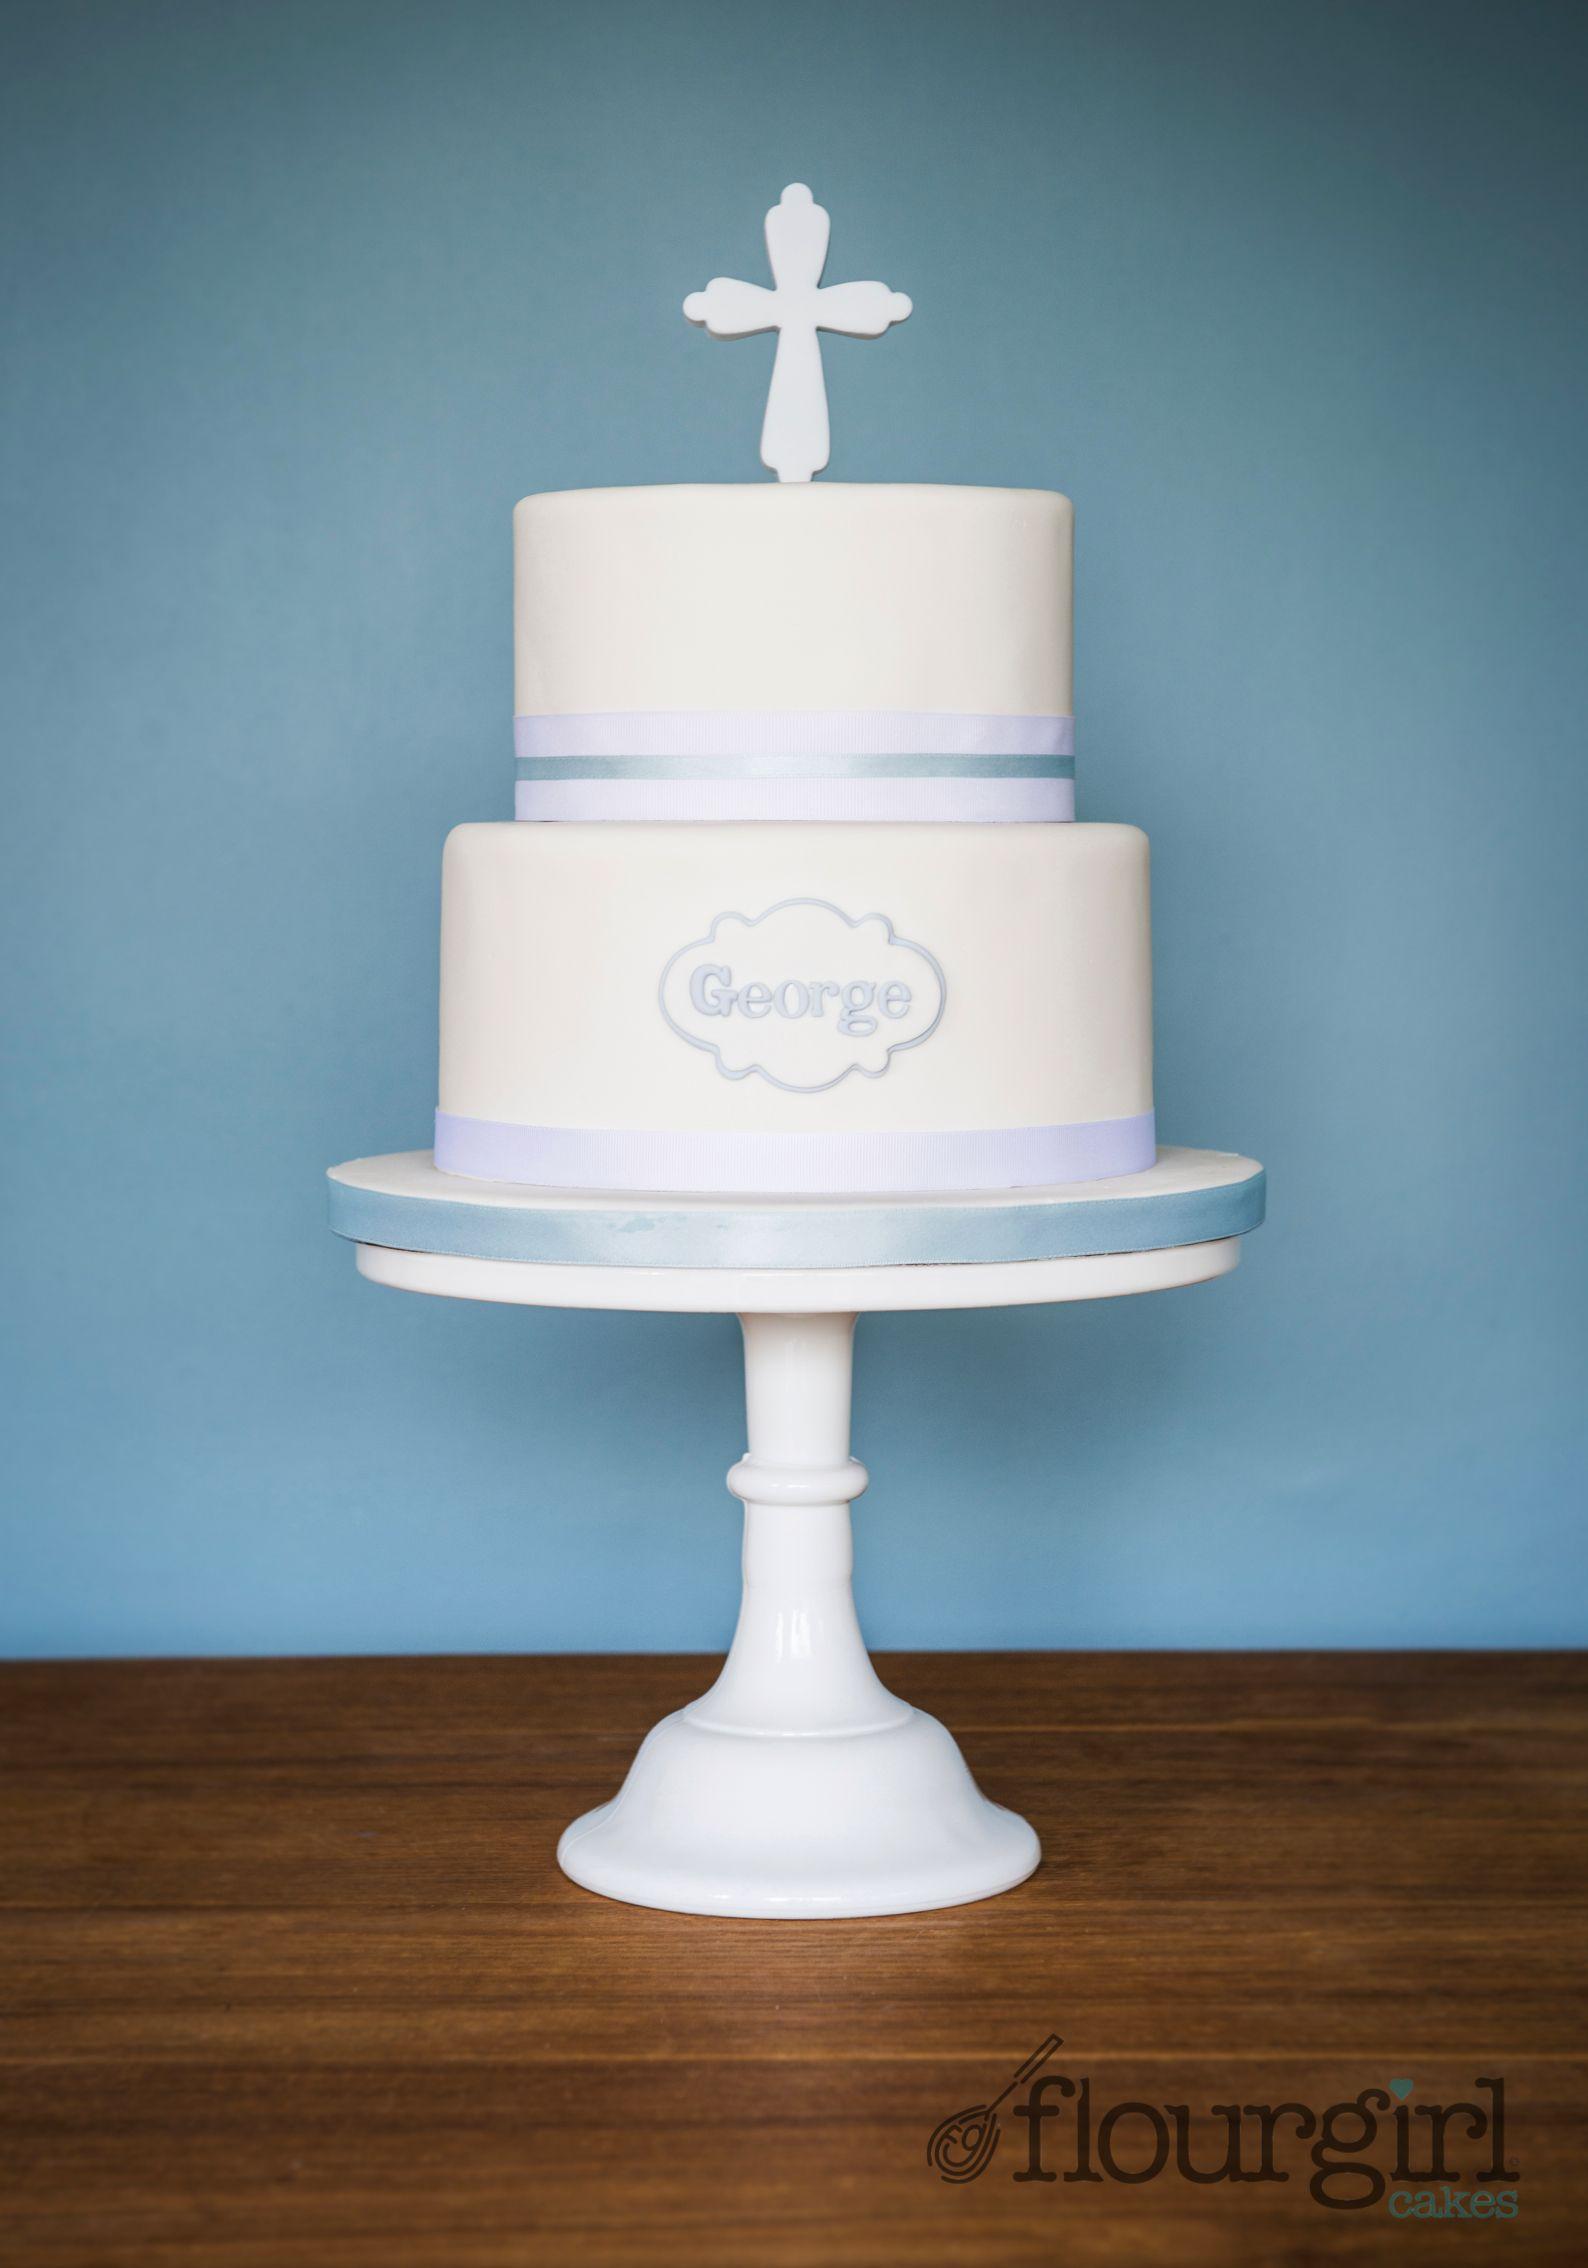 Christening Cake & Christening Cake | Primera Comunion | Pinterest | Christening cakes ...